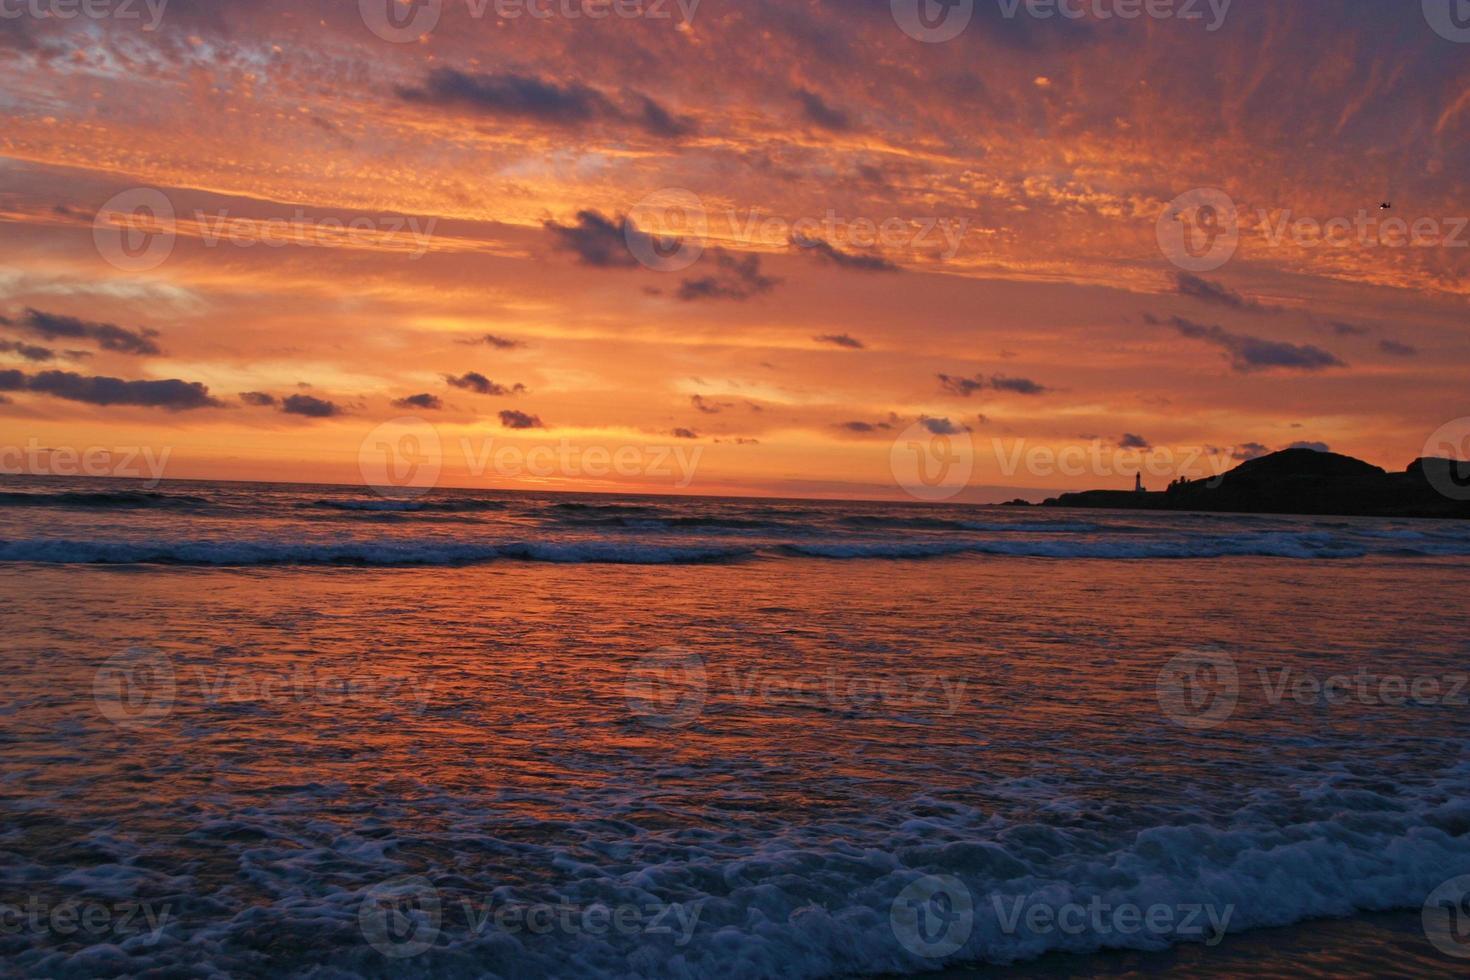 glorioso pôr do sol sobre o farol e o mar foto